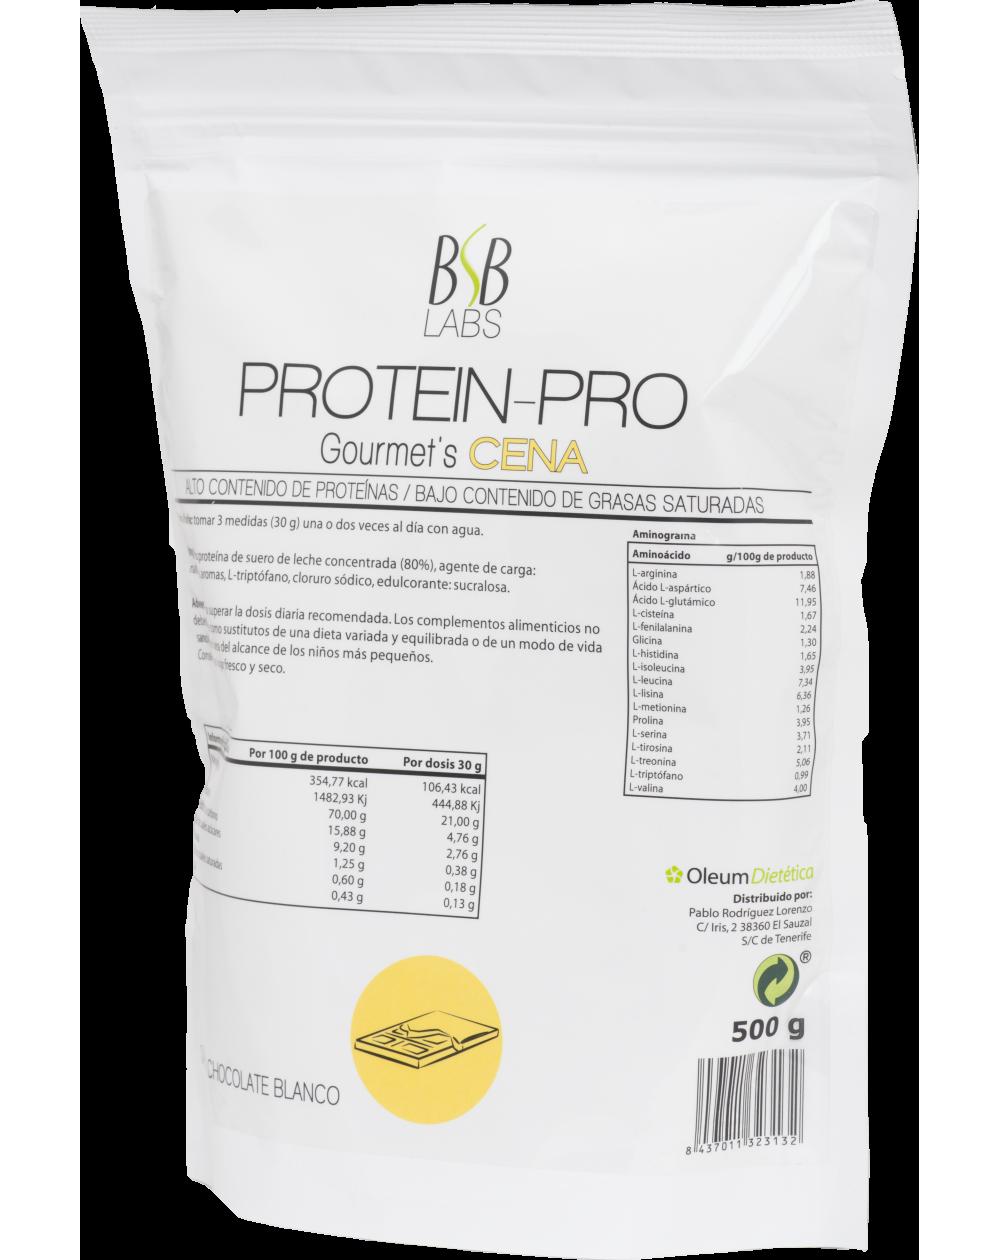 Protein-Pro Gourmet's CENA - Sabor...